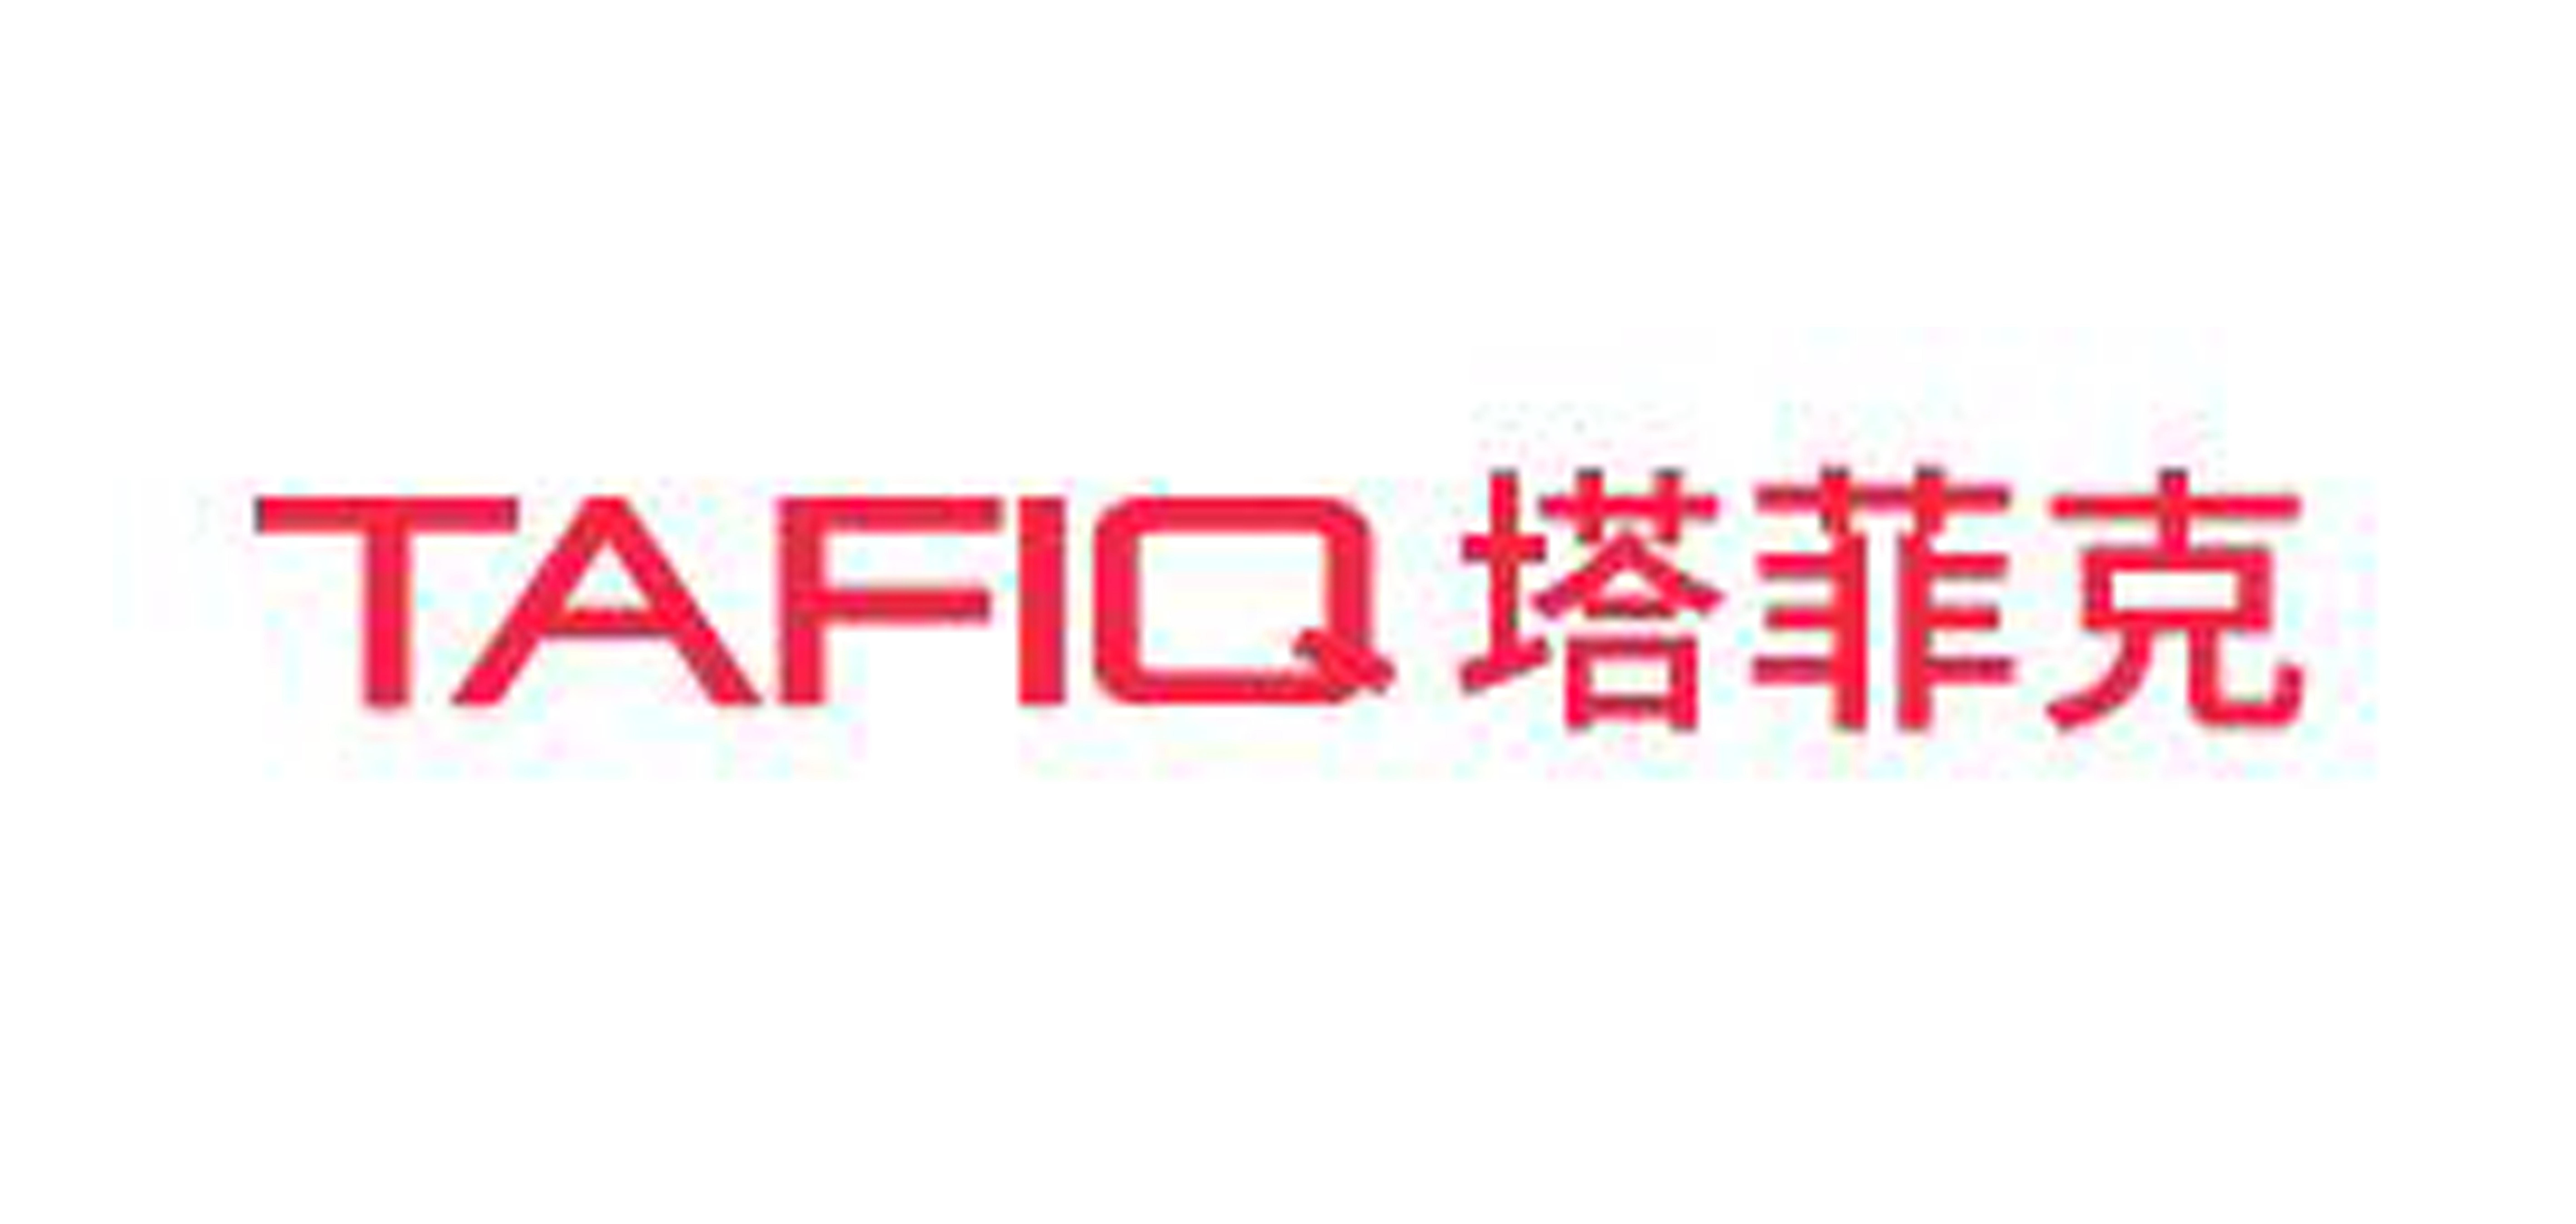 TAFIQ是什么牌子_塔菲克品牌怎么样?